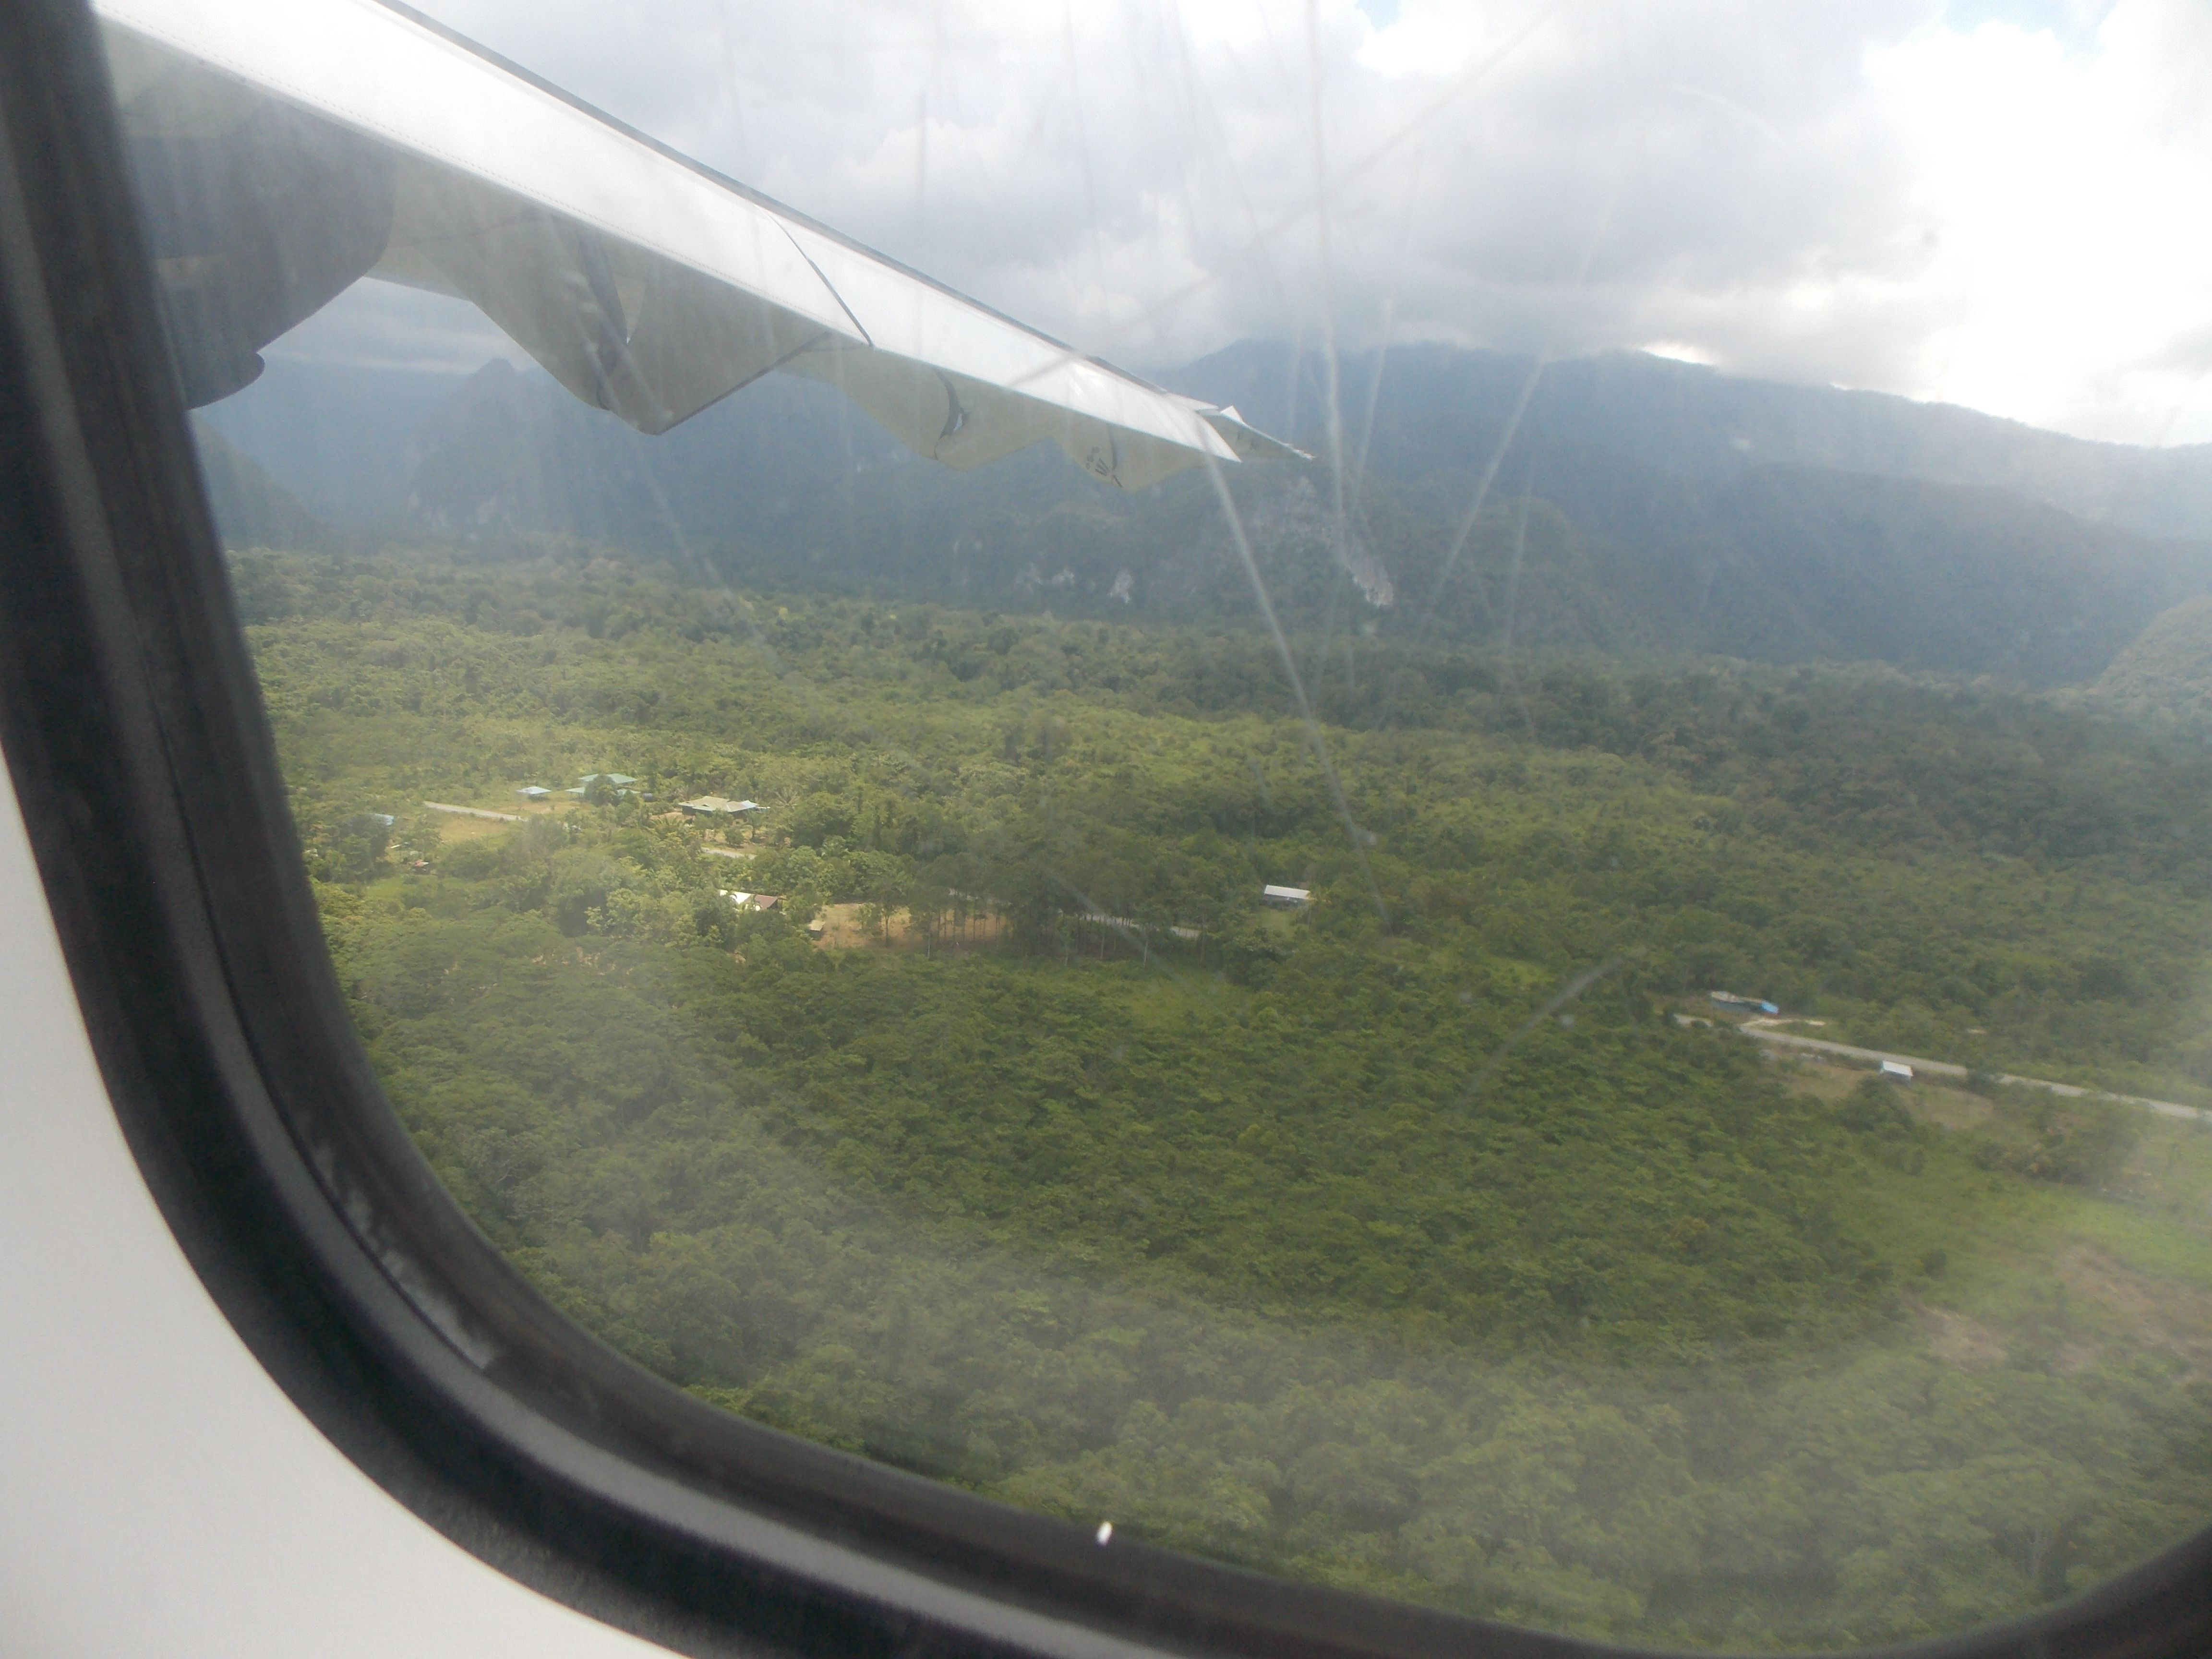 005-approaching-mulu-landing-strip